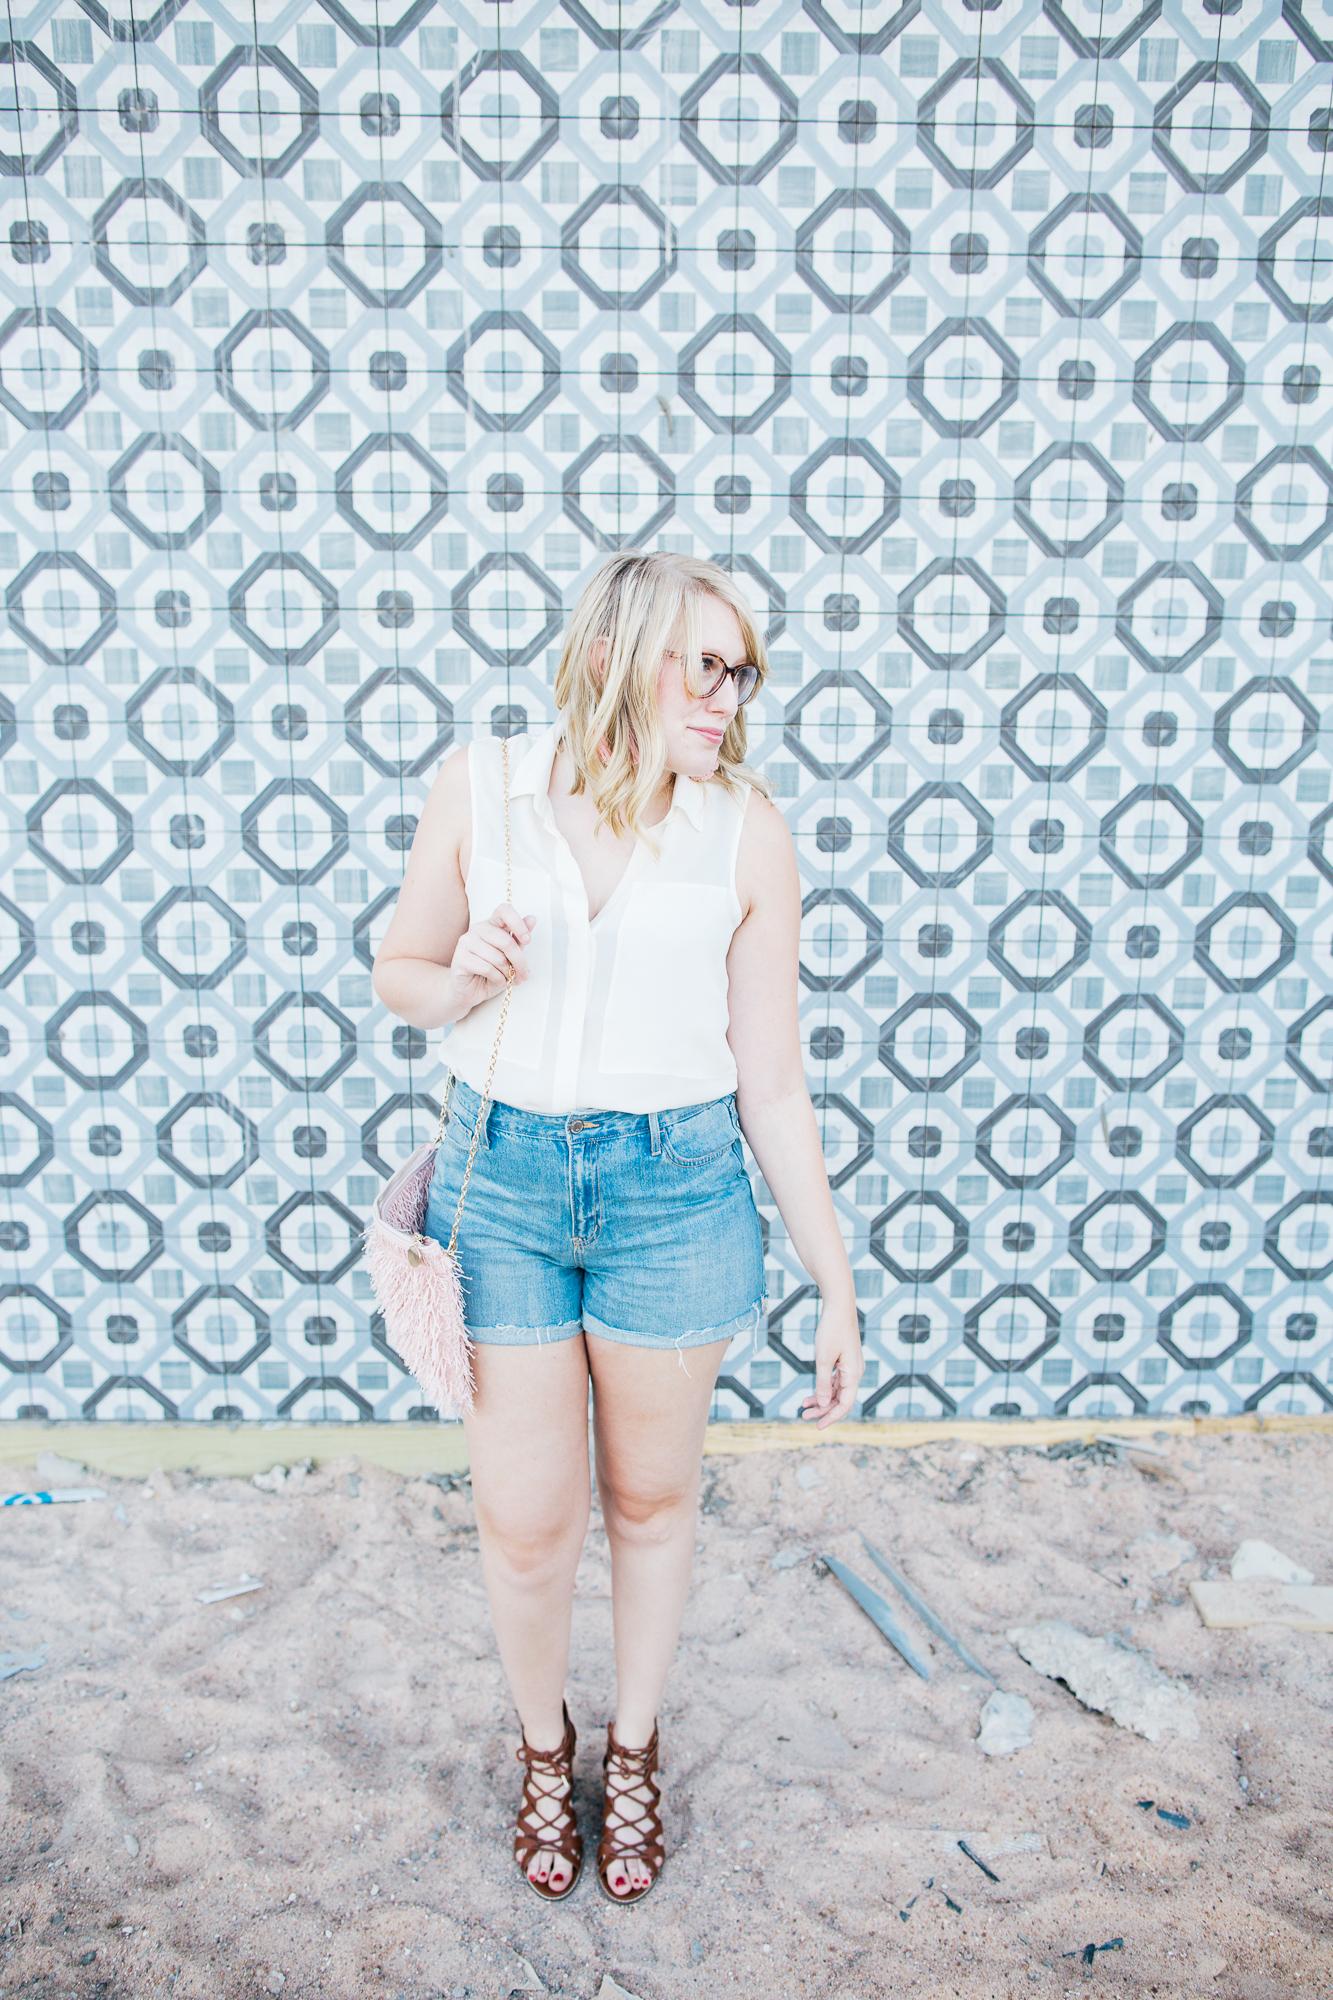 theory blouse denim shorts1